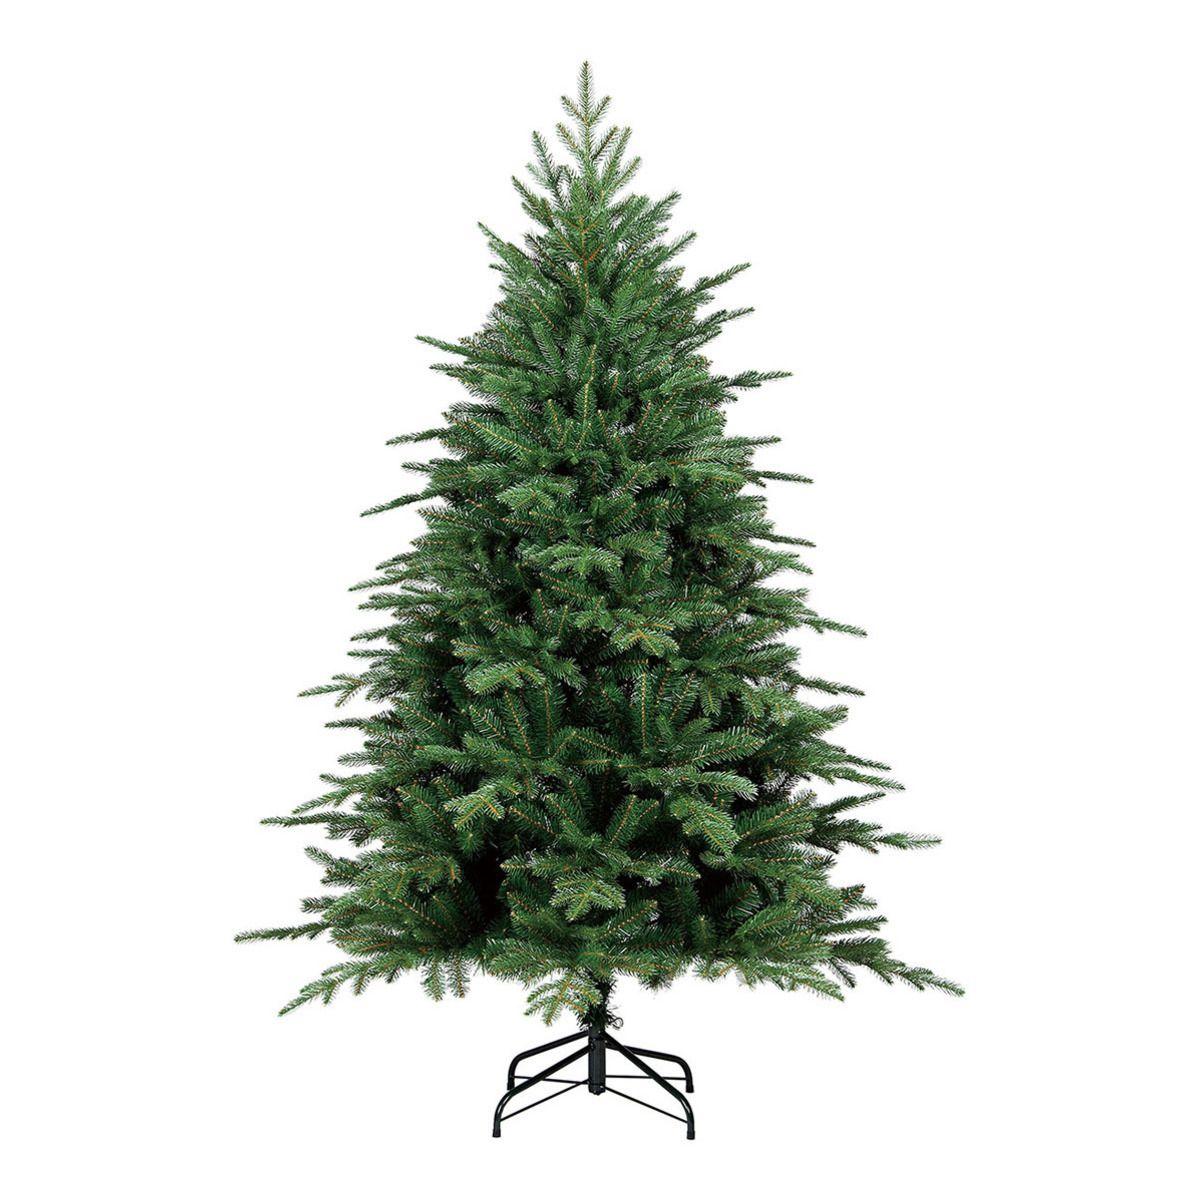 Árbol de navidad Tenesse El Corte Inglés | DECOR INSPIRATION | Pinterest